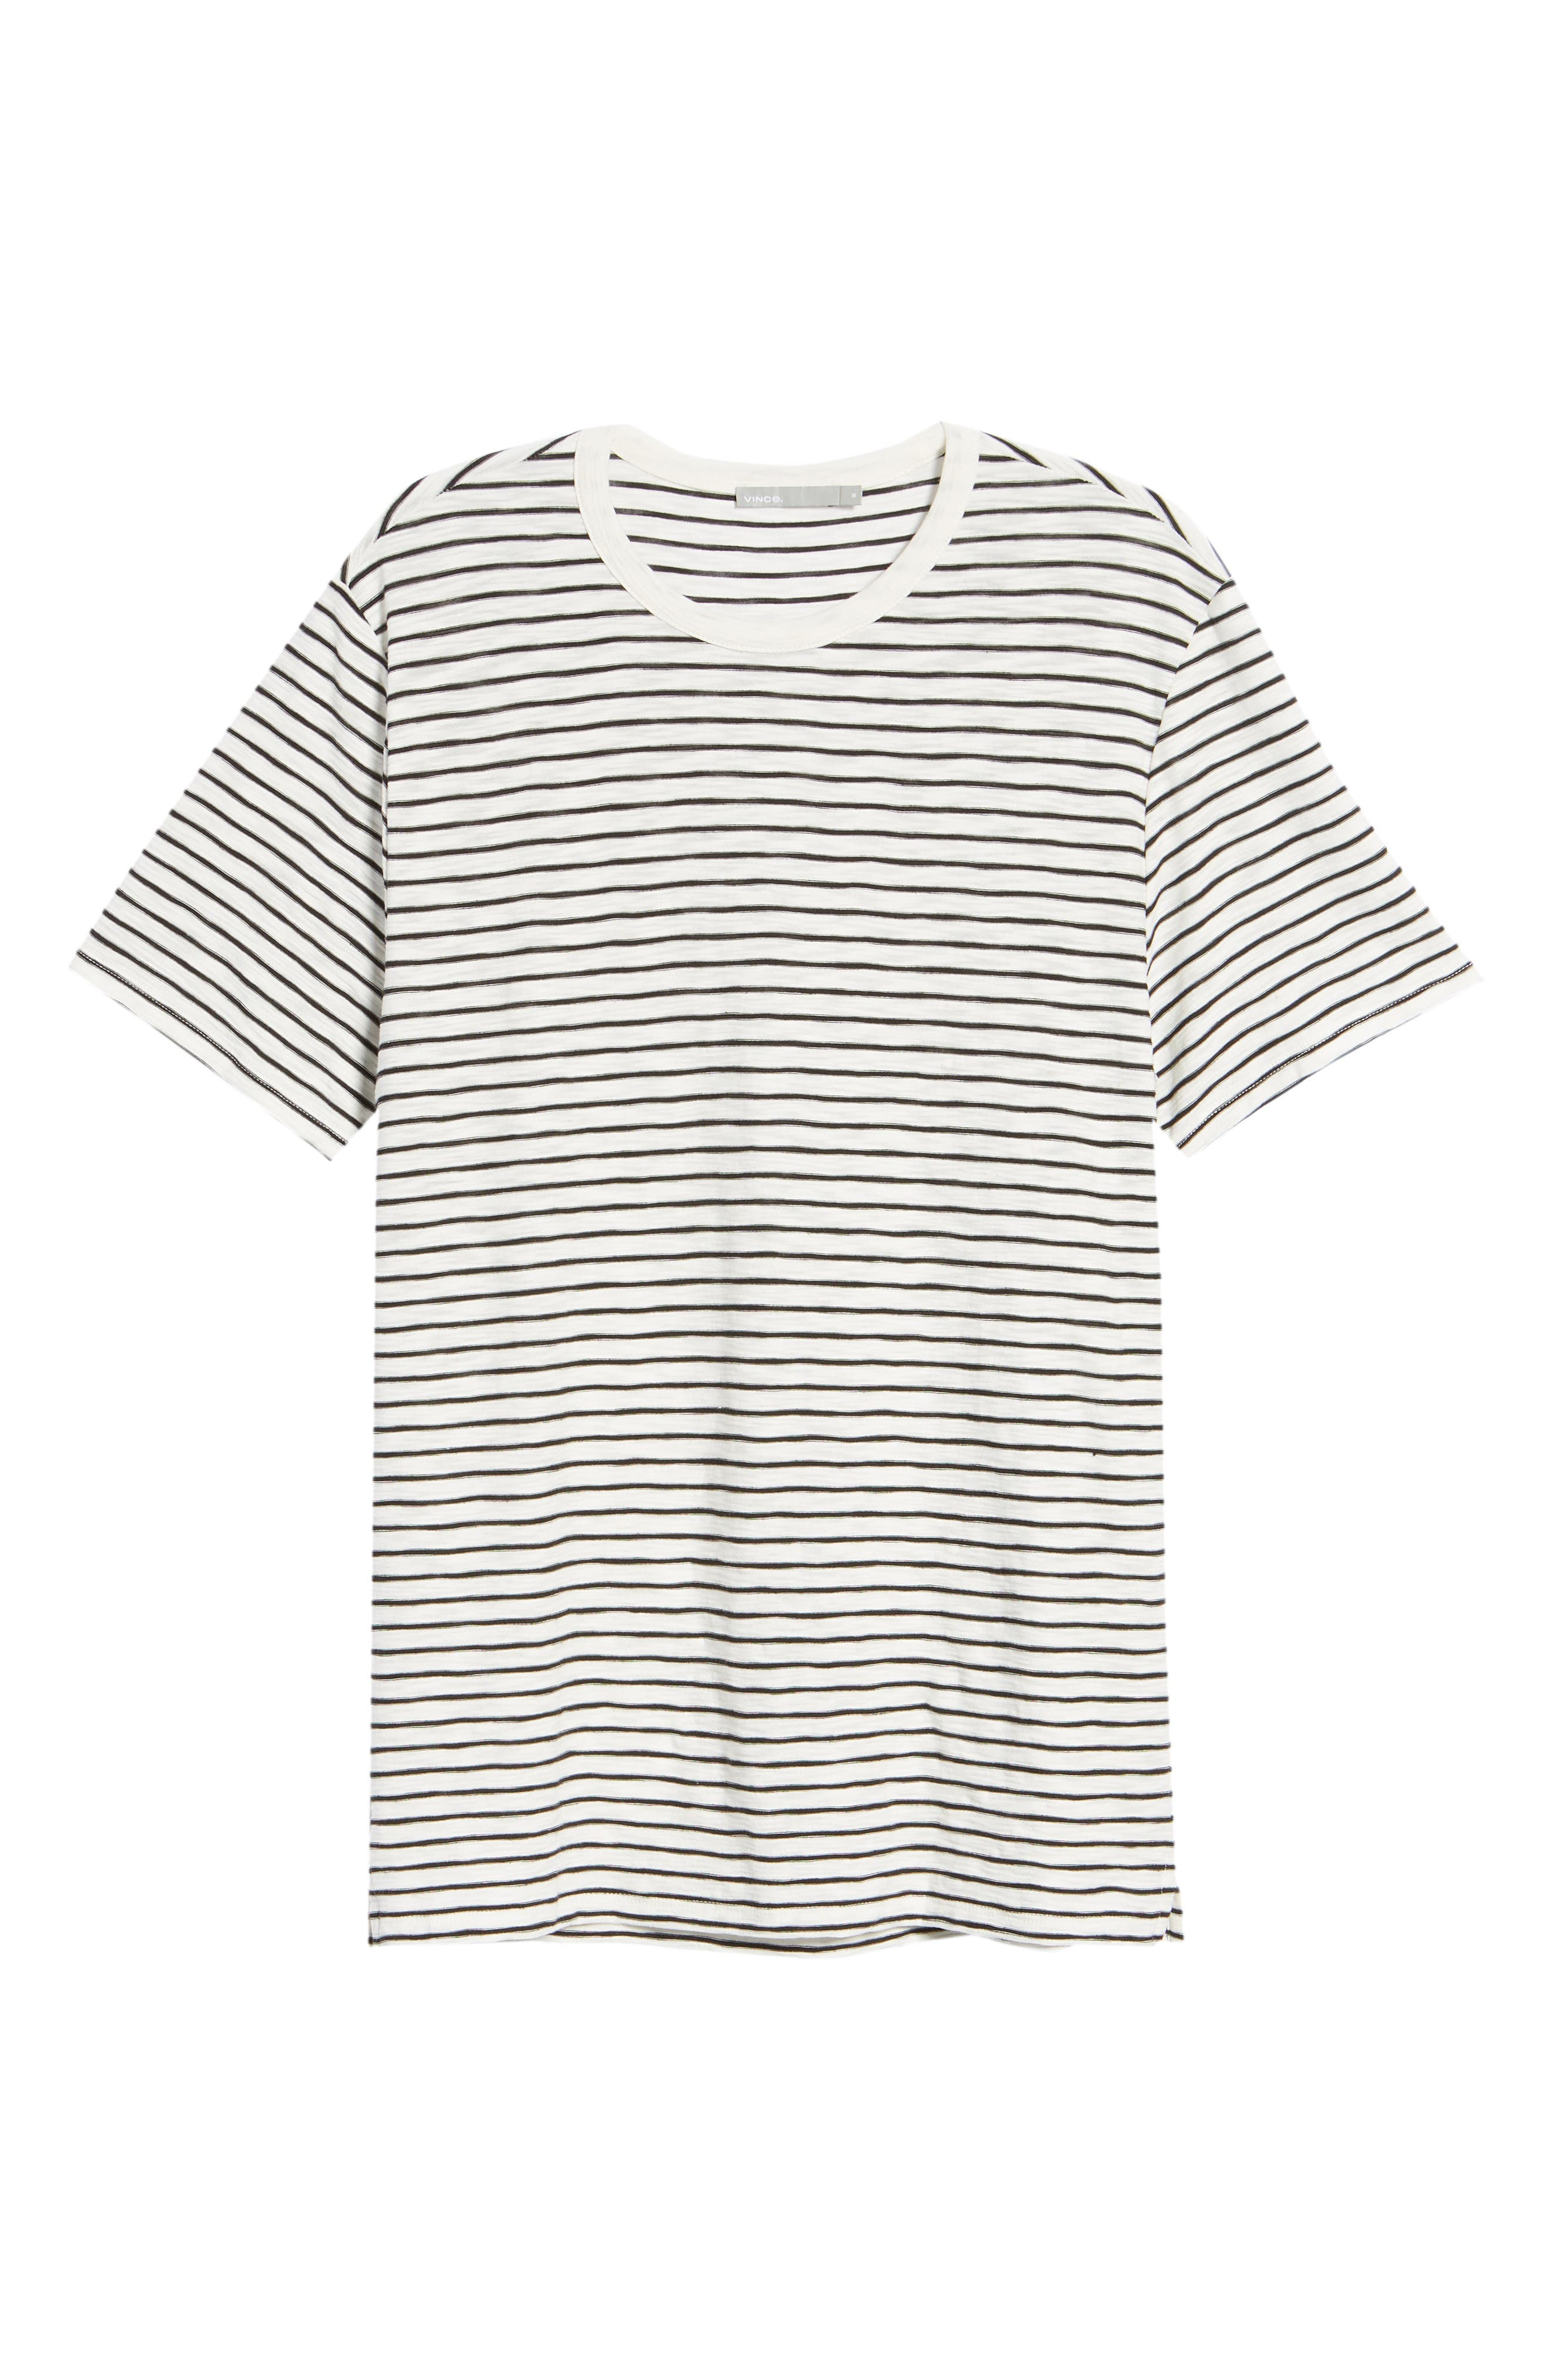 Stripe Crewneck T-Shirt,                             Alternate thumbnail 6, color,                             Off White/ Black